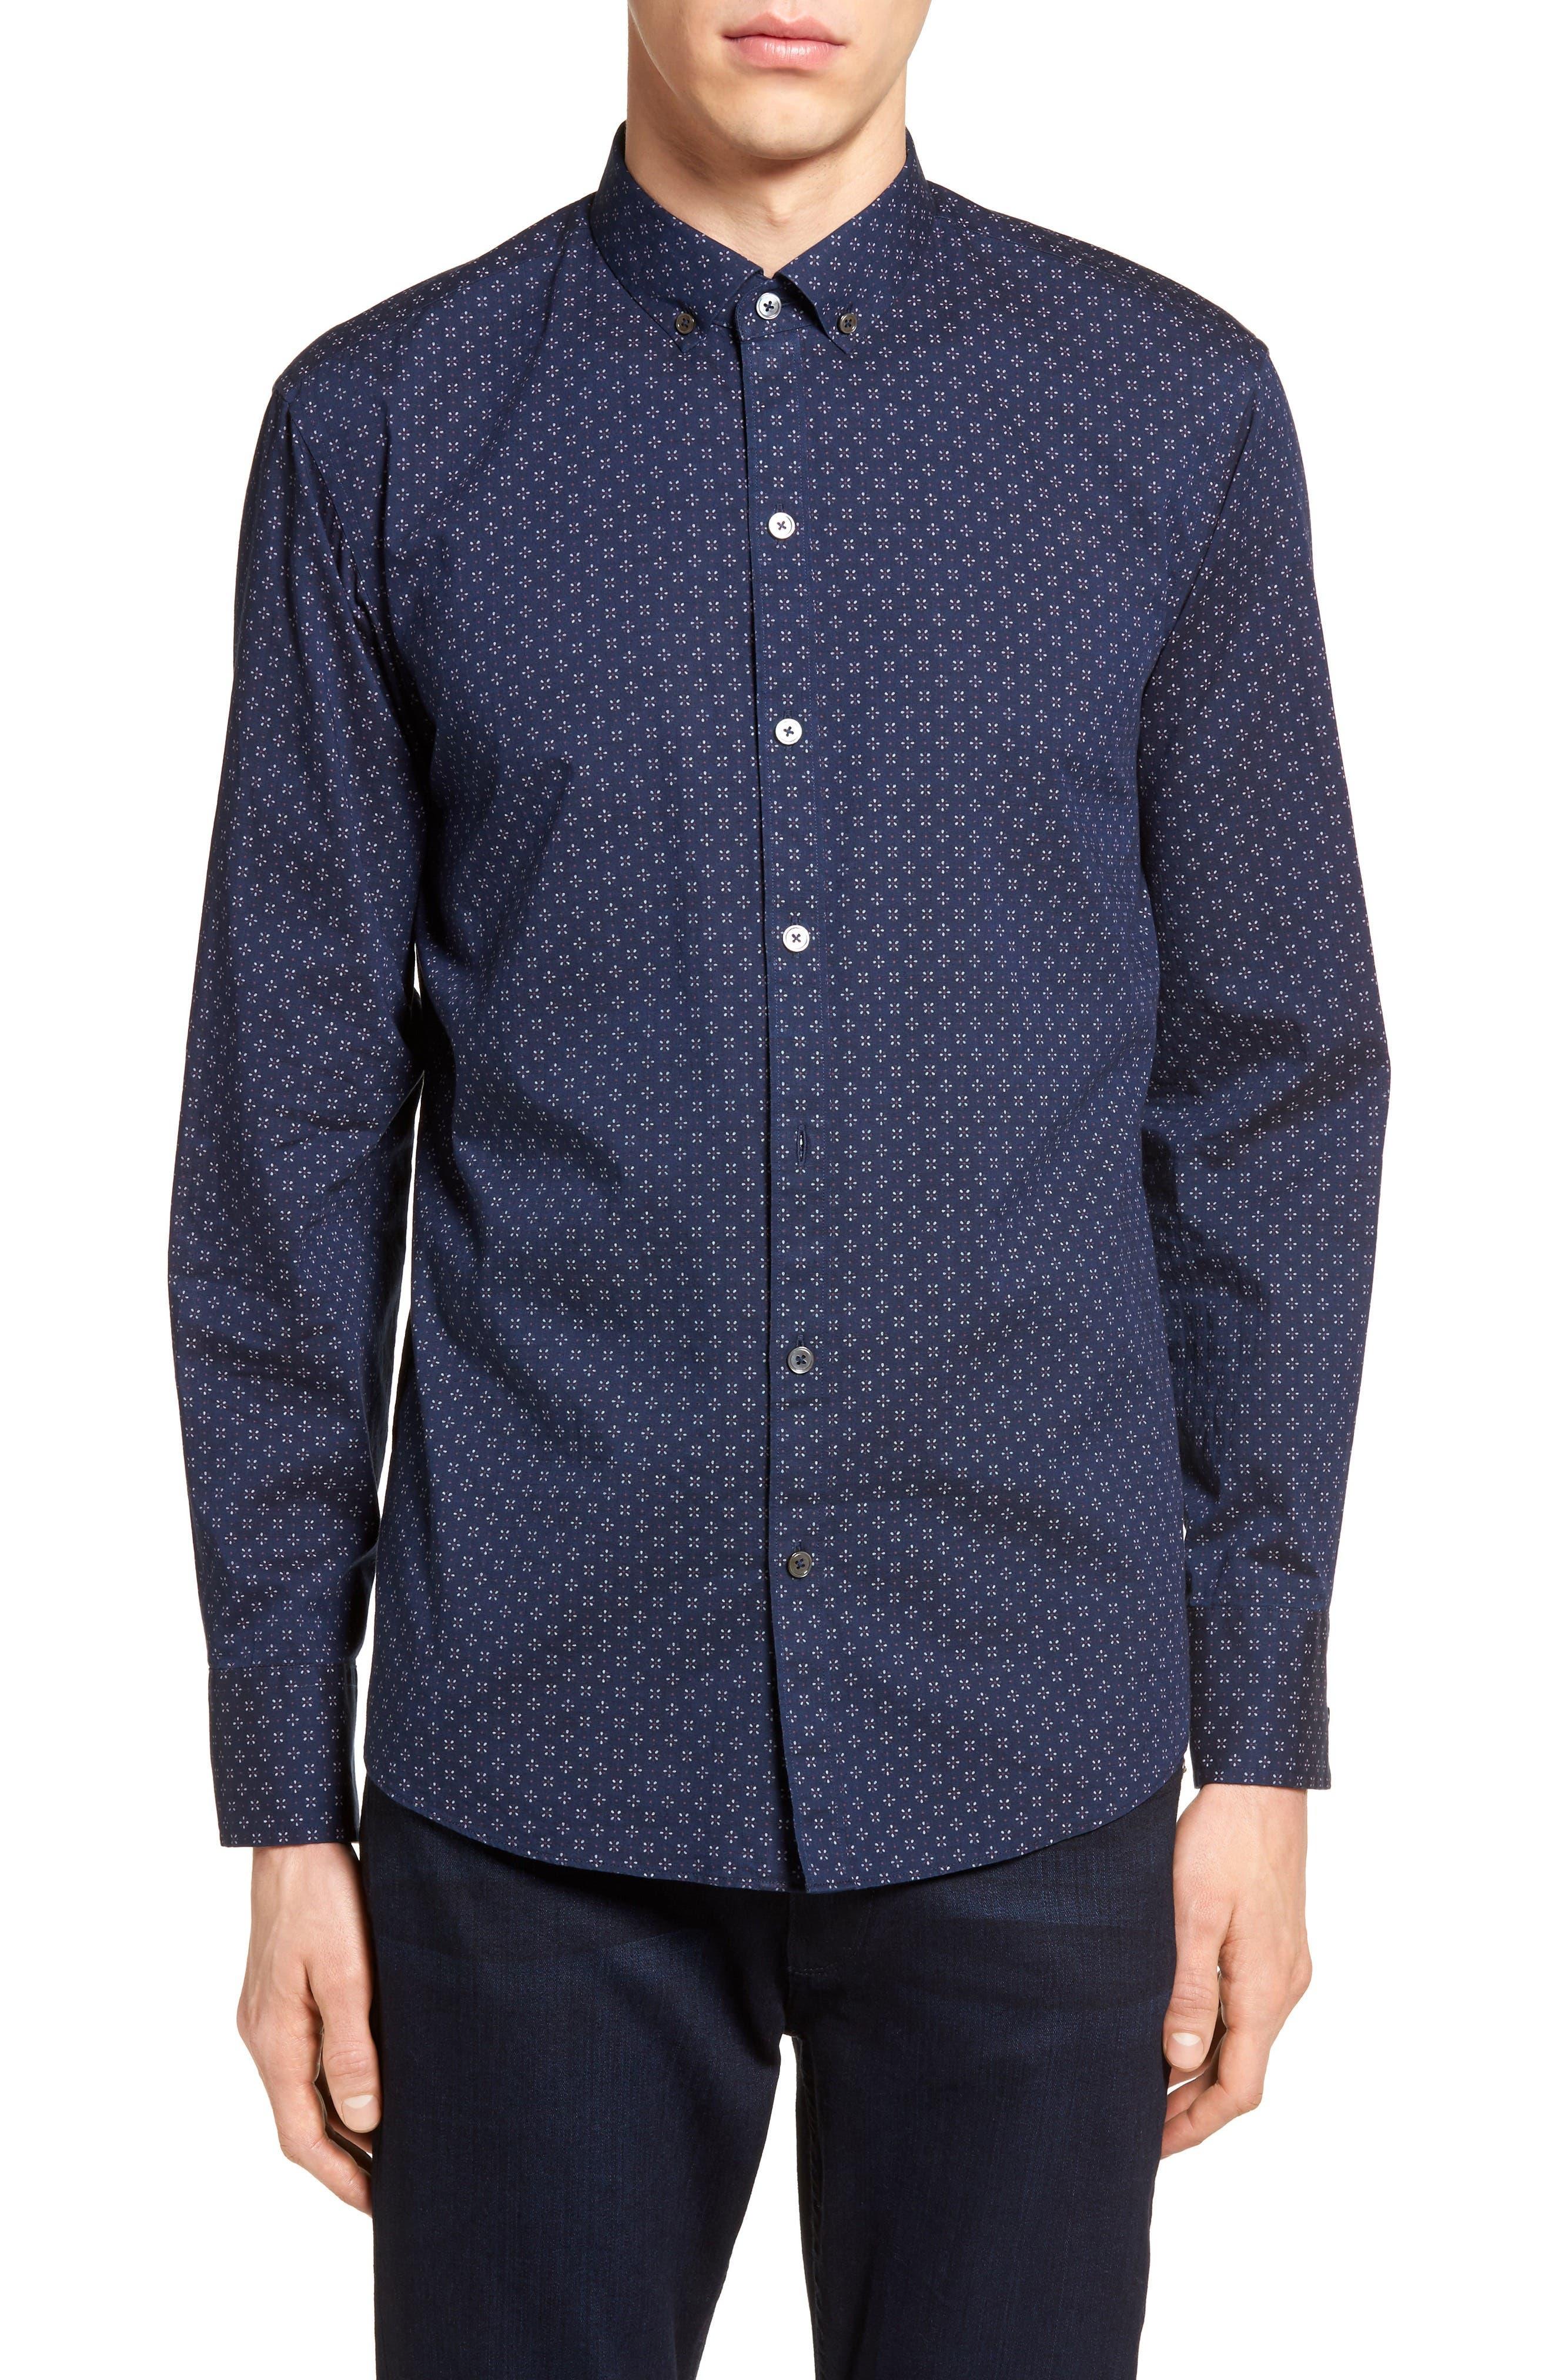 Main Image - Zachary Prell Kinnear Slim Fit Print Shirt